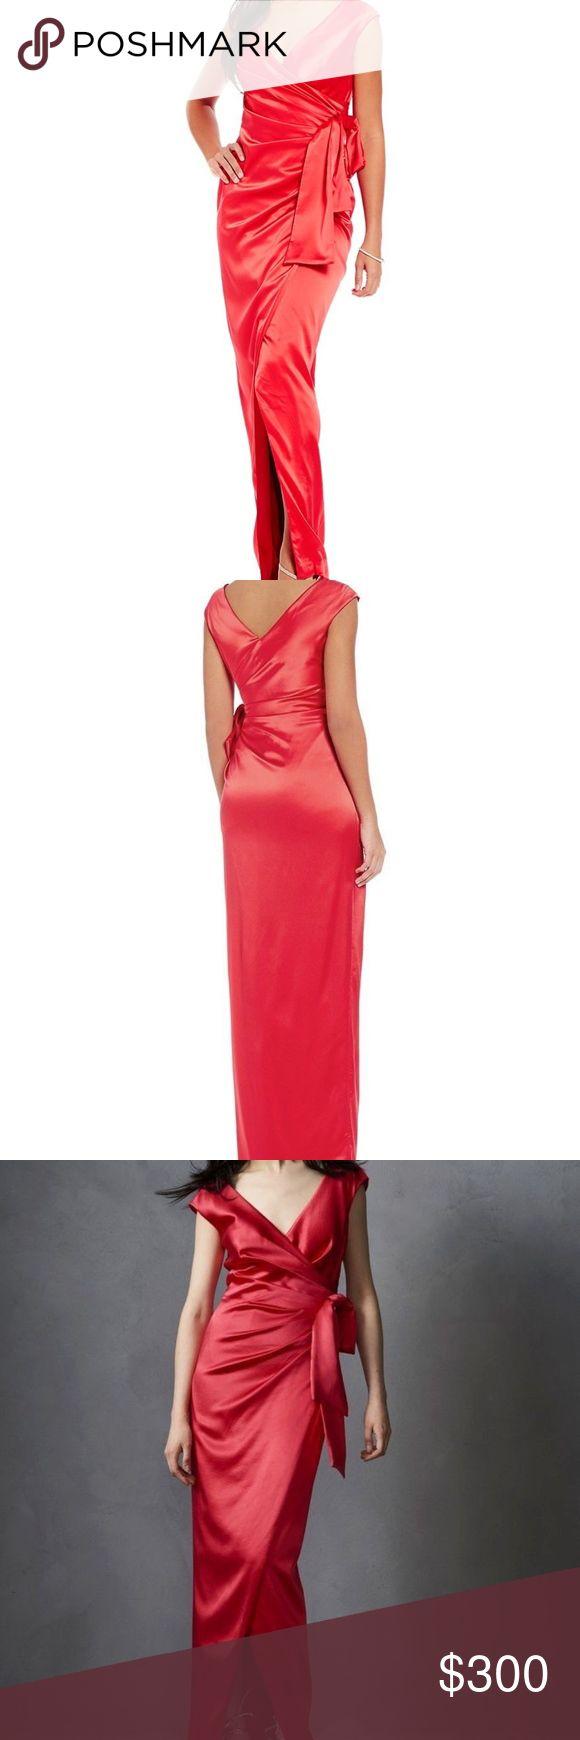 Kay Unger Stretch Satin Sheath faux wrap dress Kay Unger Stretch Satin Sheath Party prom faux wrap Formal gown maxi dress SZ 14 color..Persimmon Kay Unger Dresses Maxi